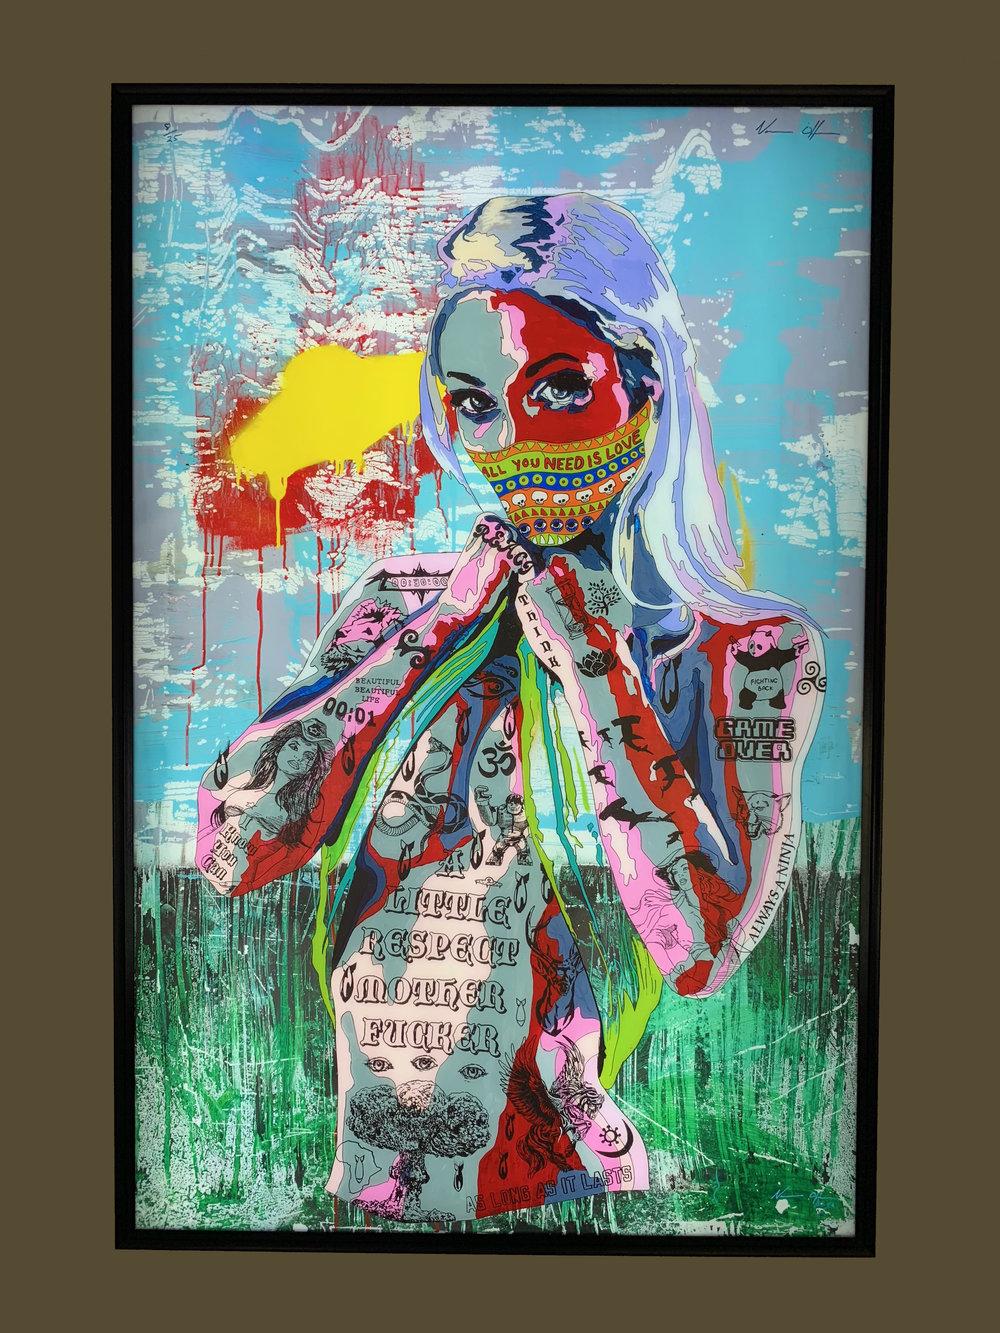 [Art Supermarket] Norman O'Flynn_Timekeeper37_All you need is love_Lightbox_150x100x10cm_3D.jpg